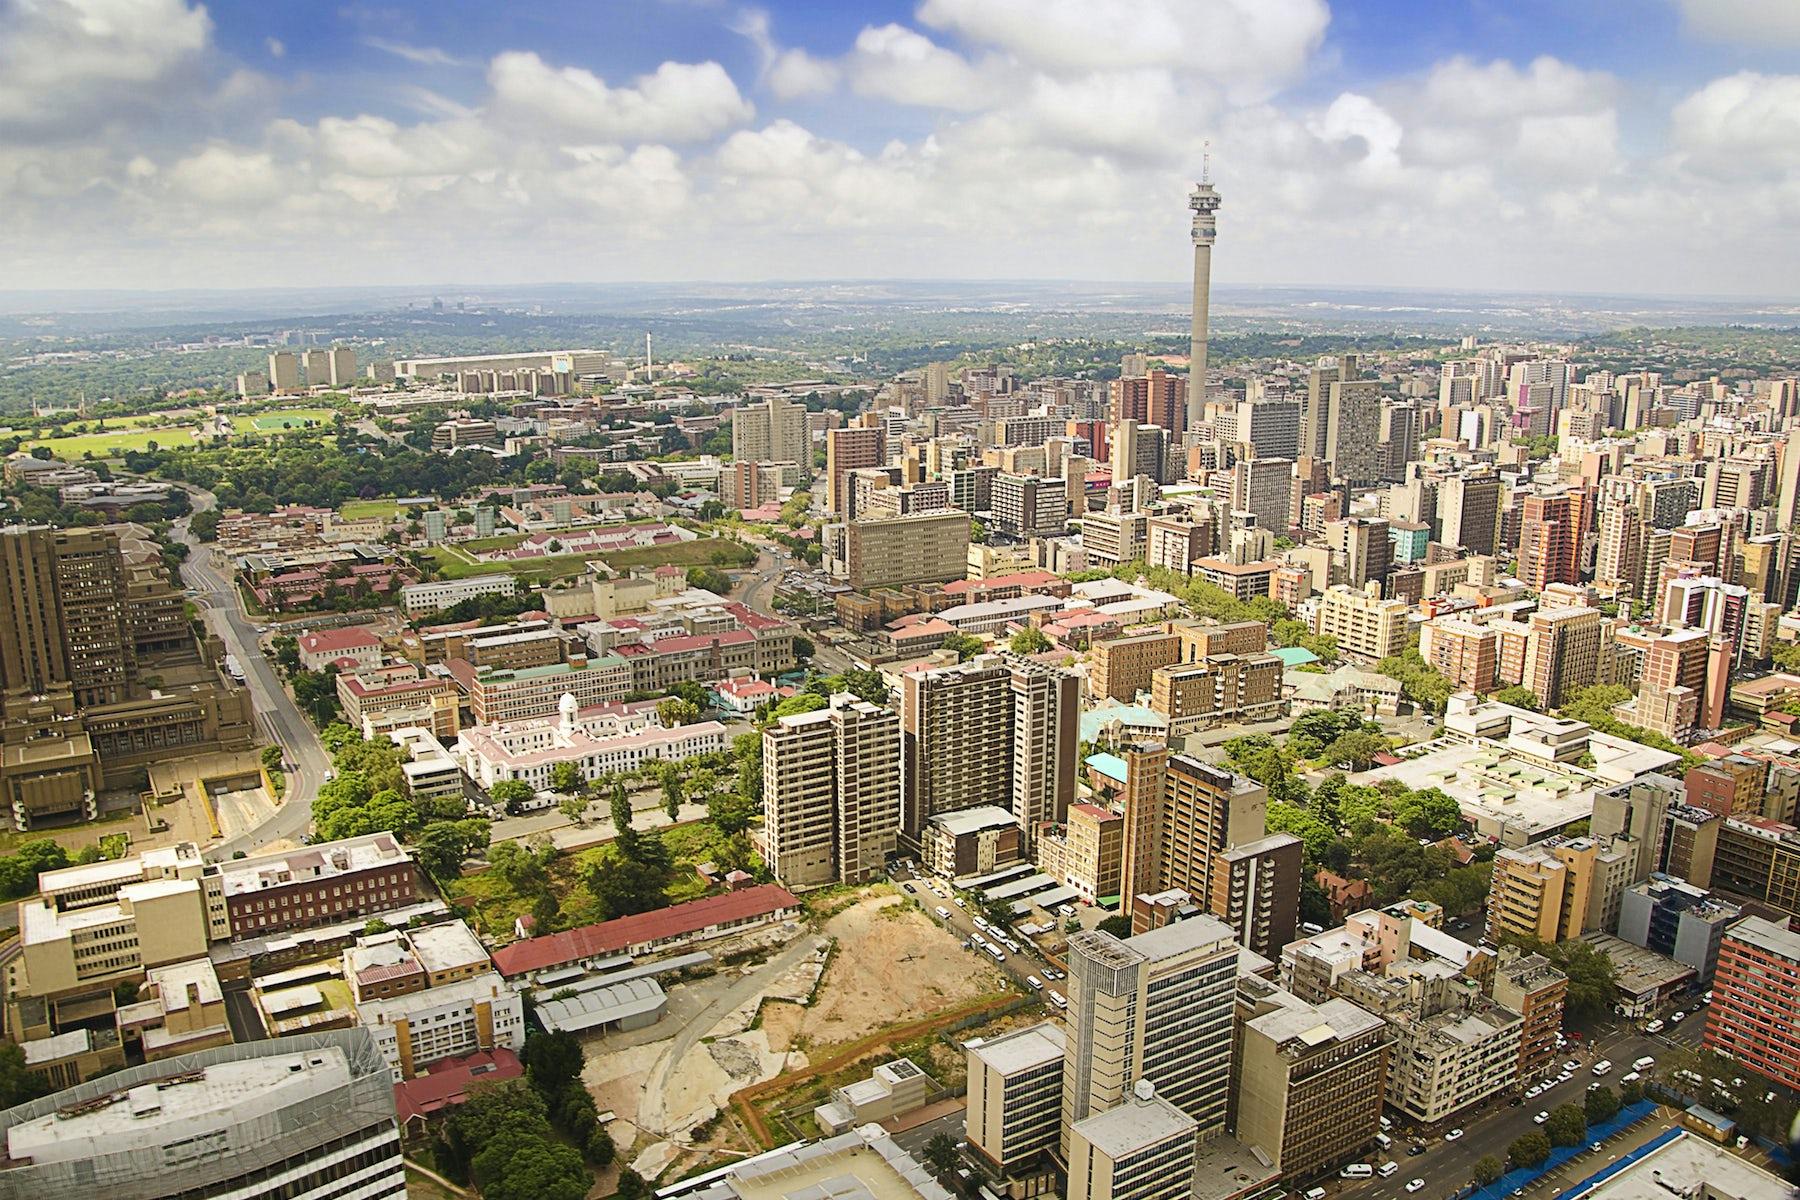 Johannesburg skyline | Source: Shutterstock